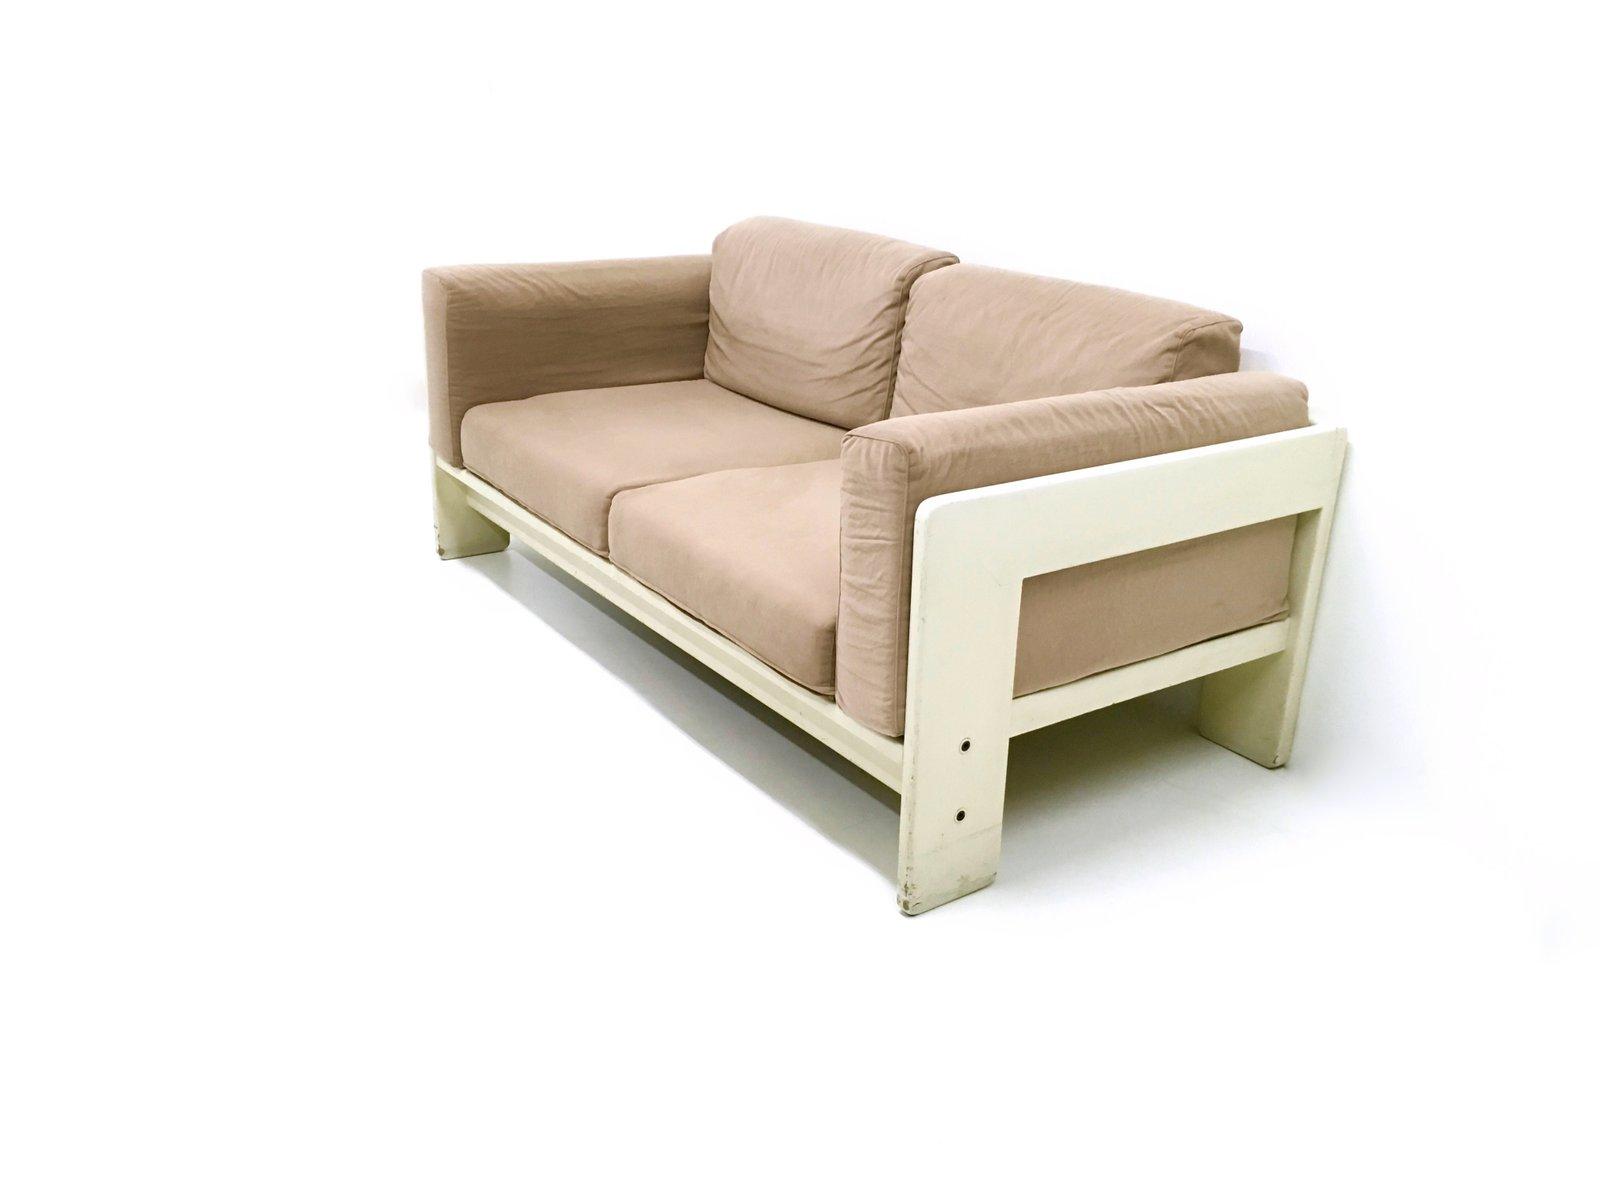 bastiano sofa von tobia scarpa f r knoll 1970er bei. Black Bedroom Furniture Sets. Home Design Ideas